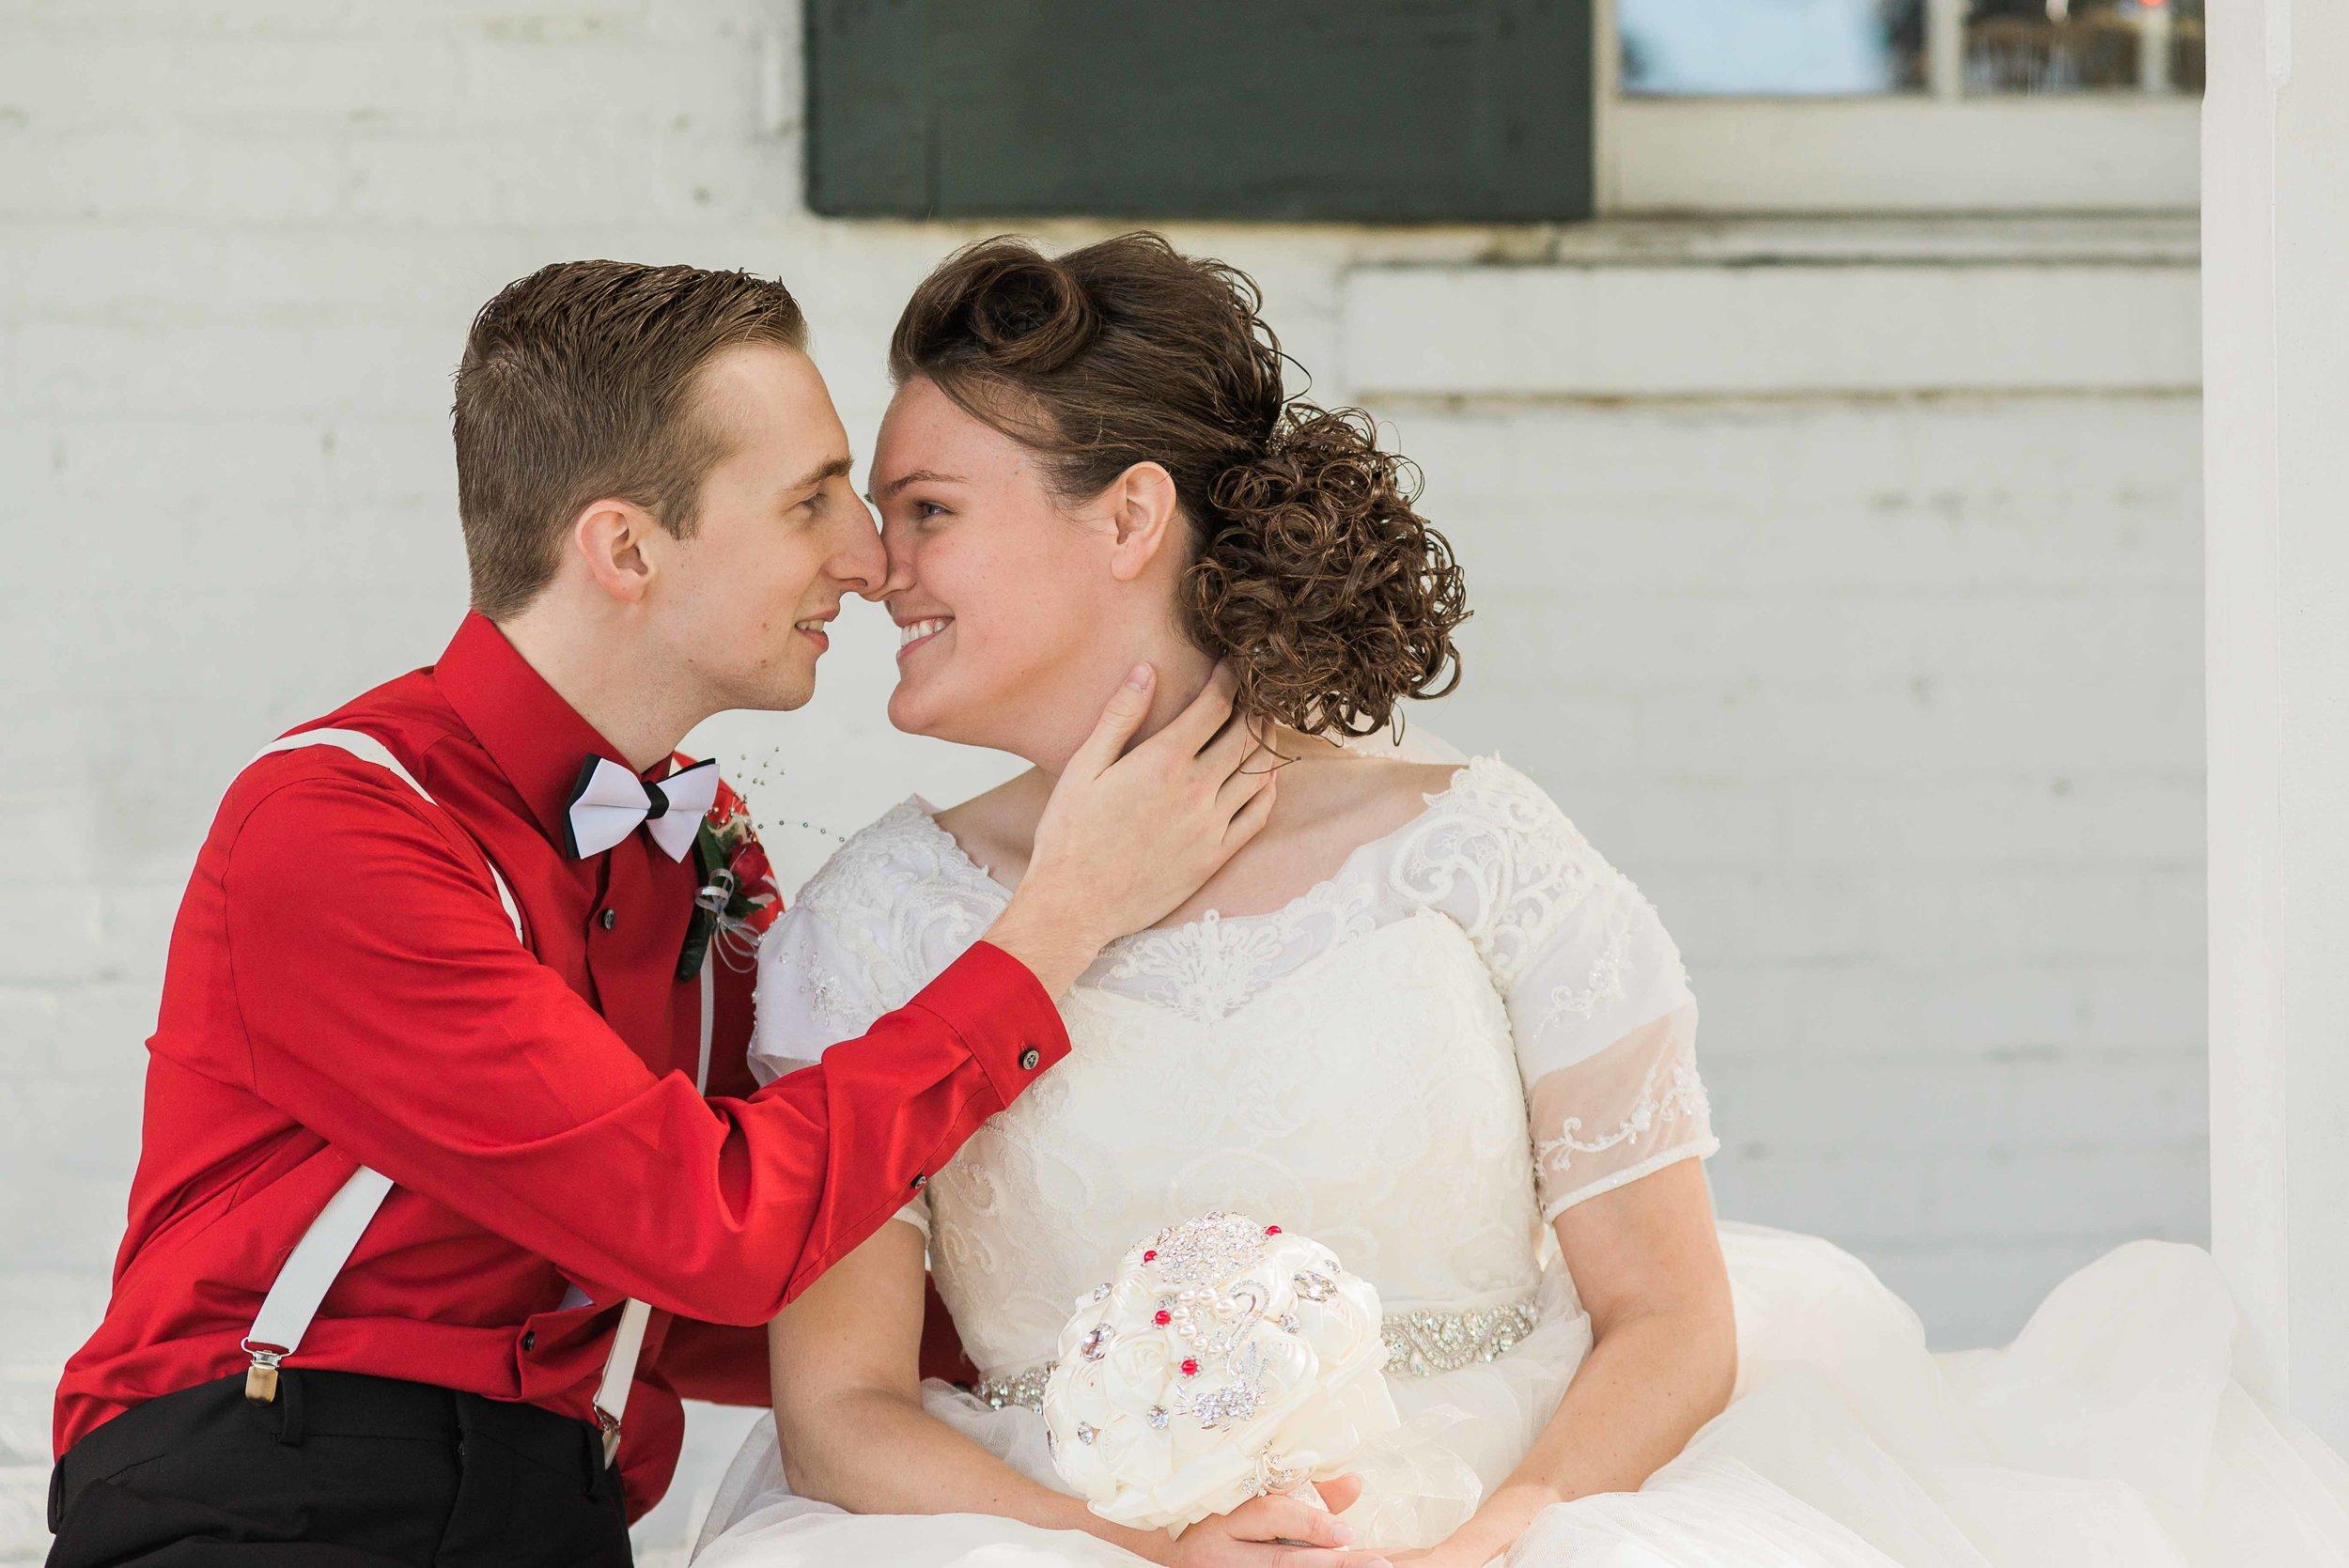 McConnell House, Wurtland, KY wedding